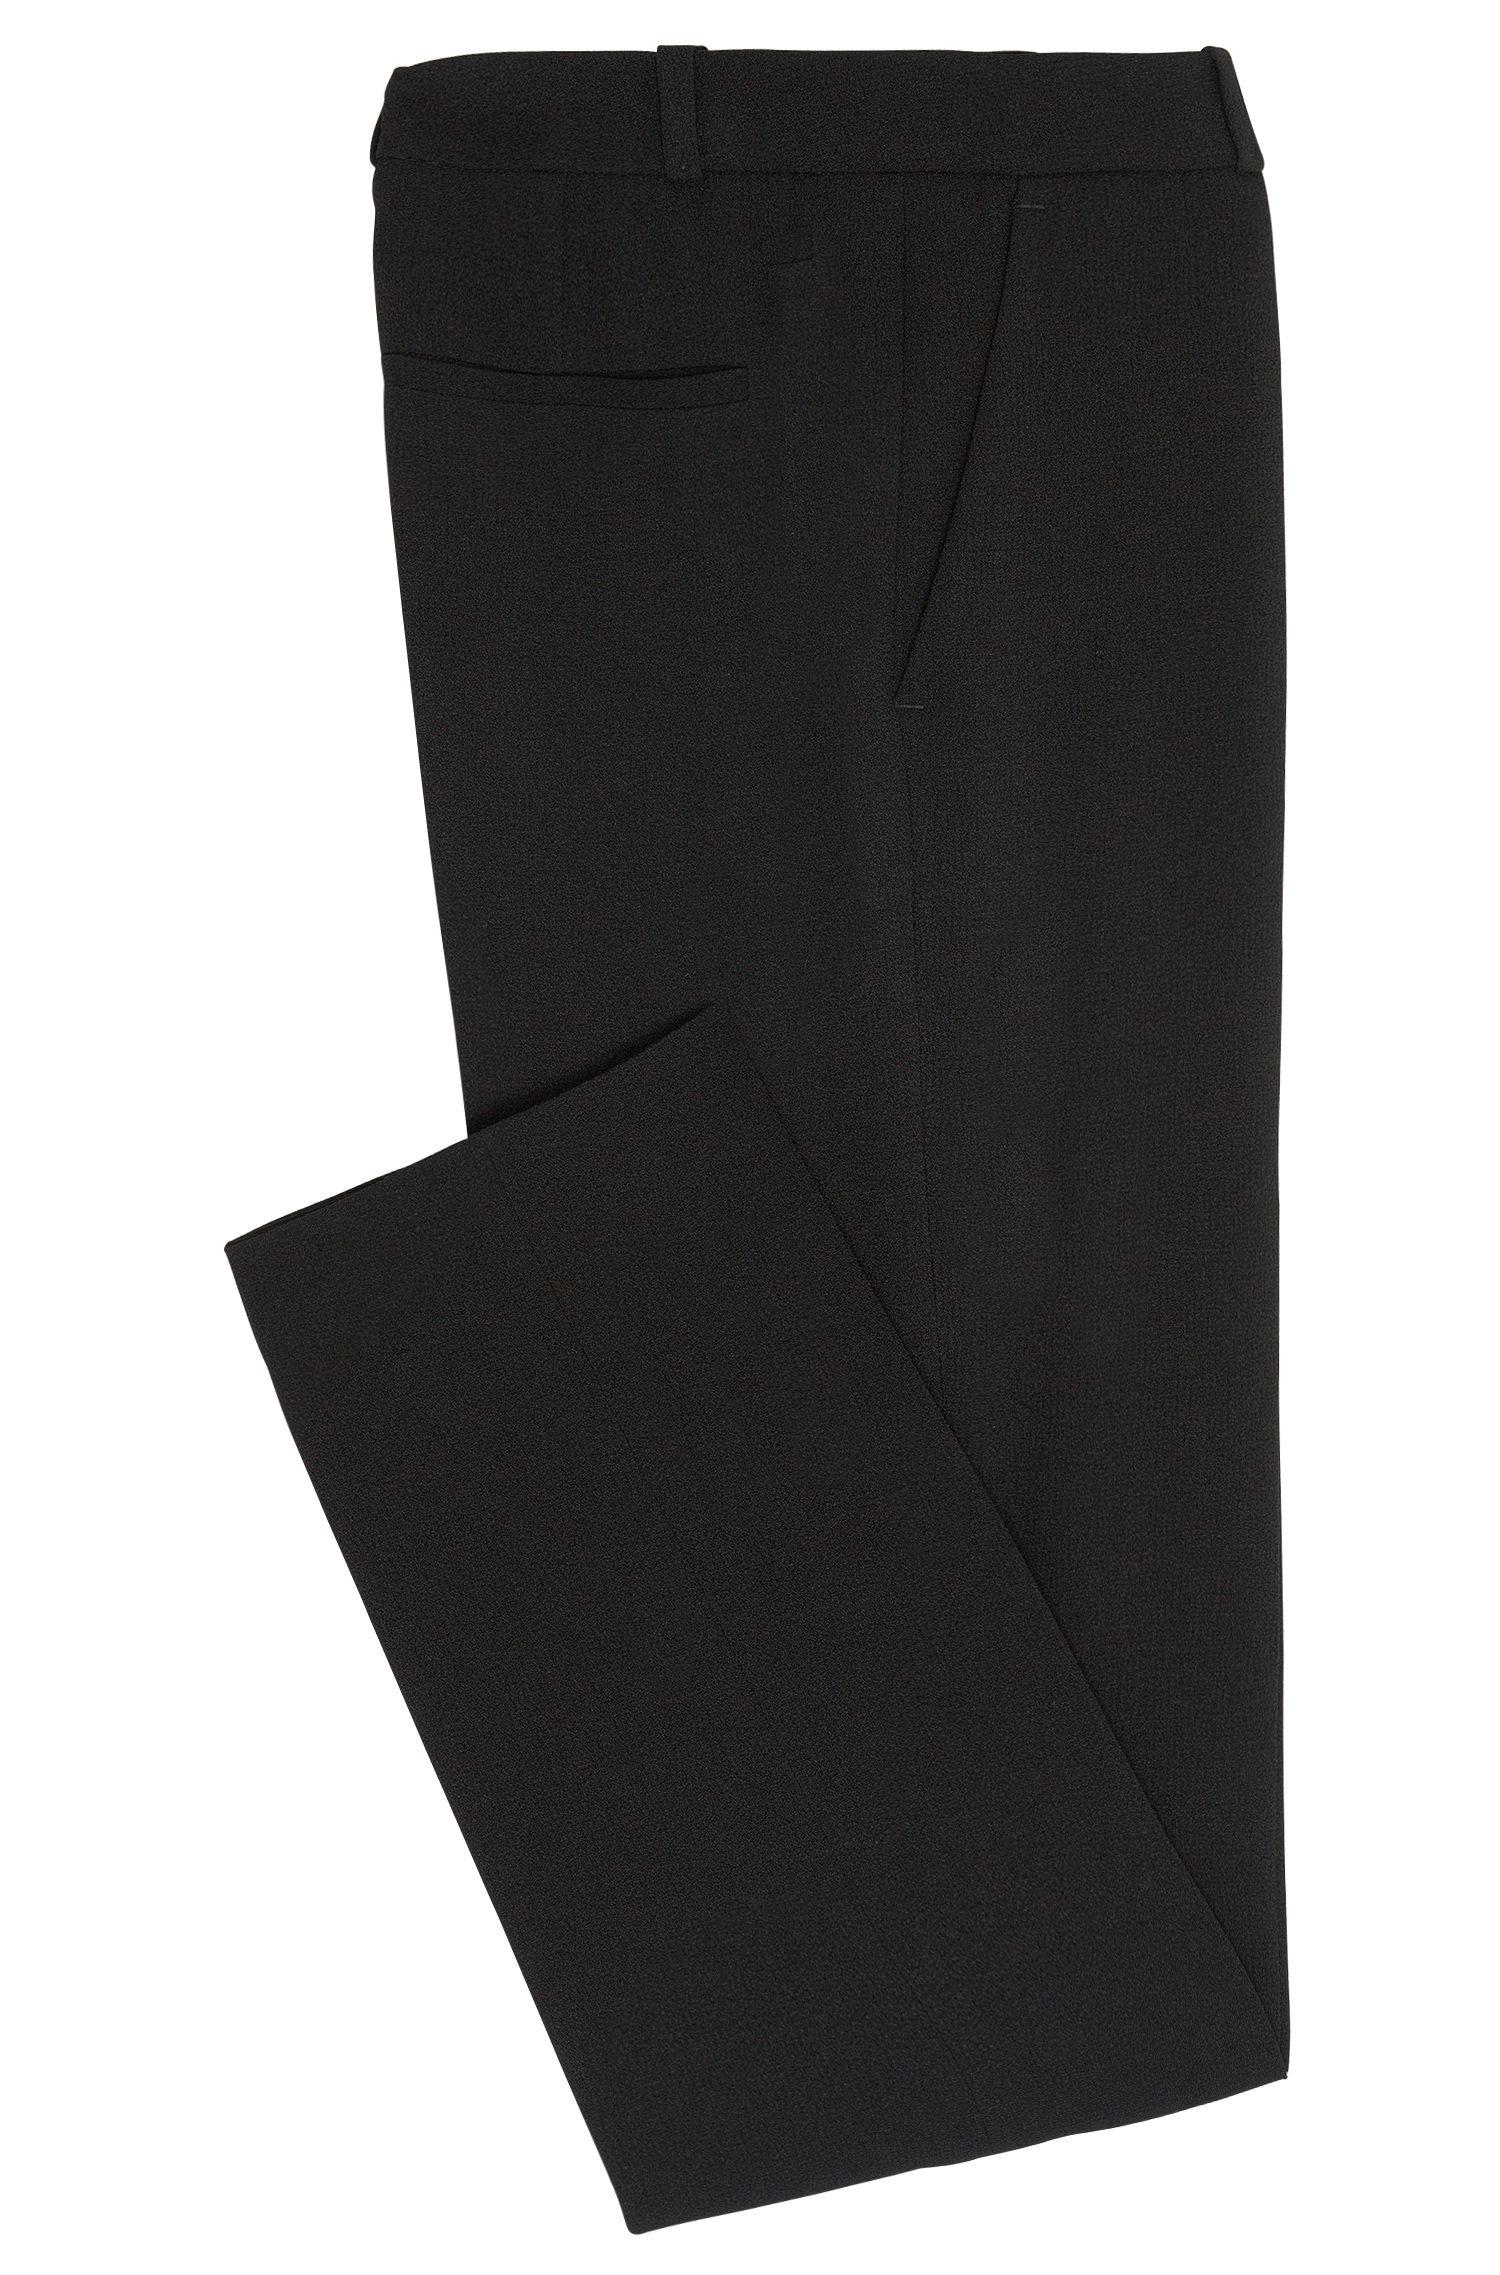 Cropped-Hose aus strukturiertem Gewebe: 'Tobela1'